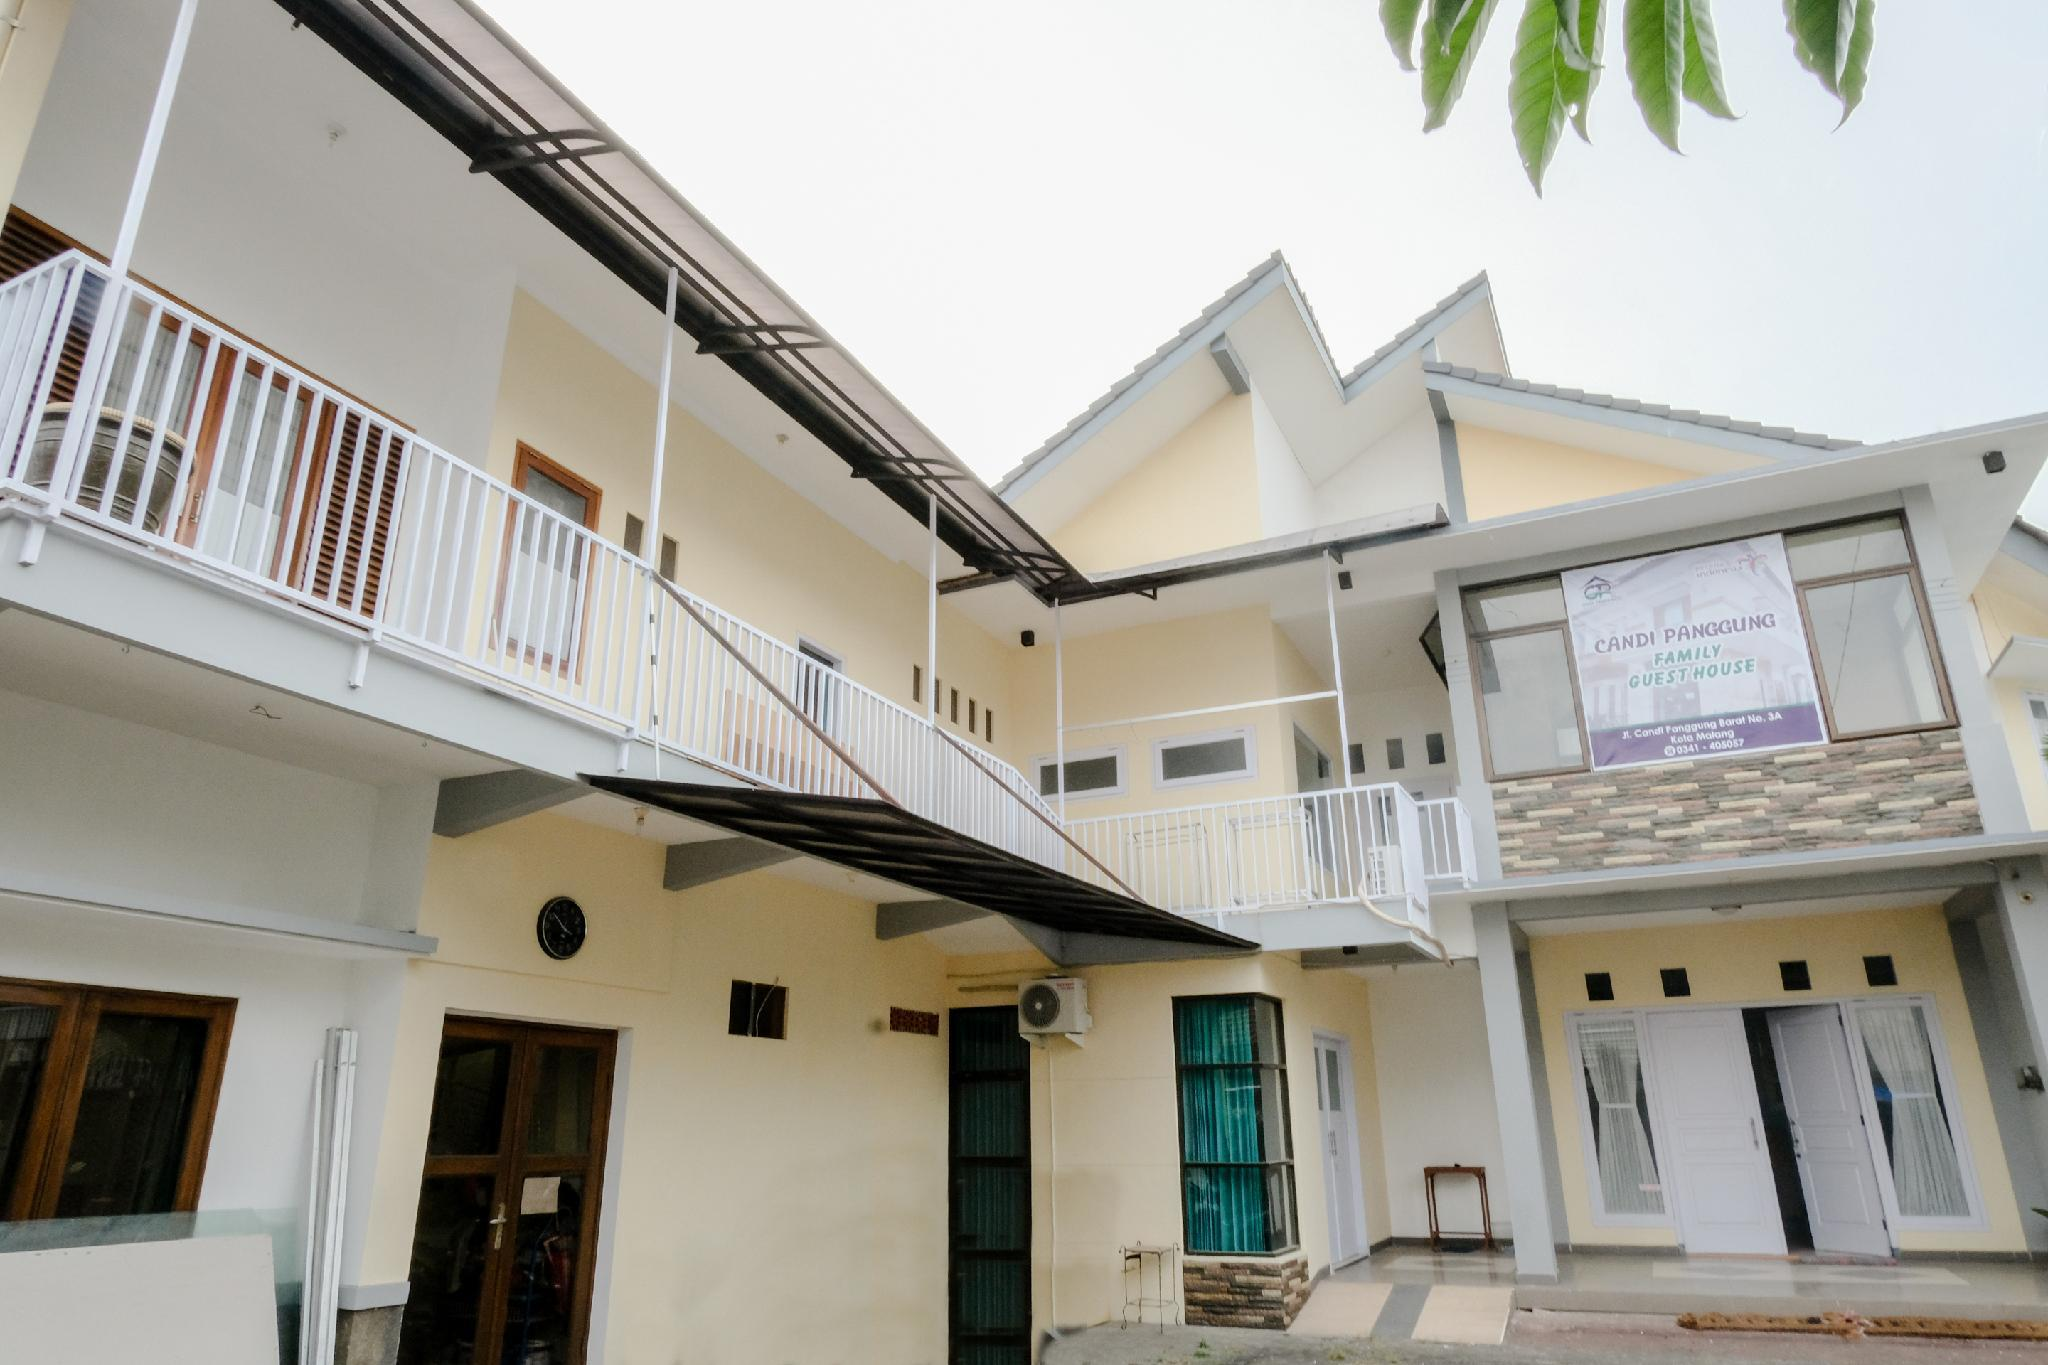 OYO 1509 Candi Panggung Family Guest House